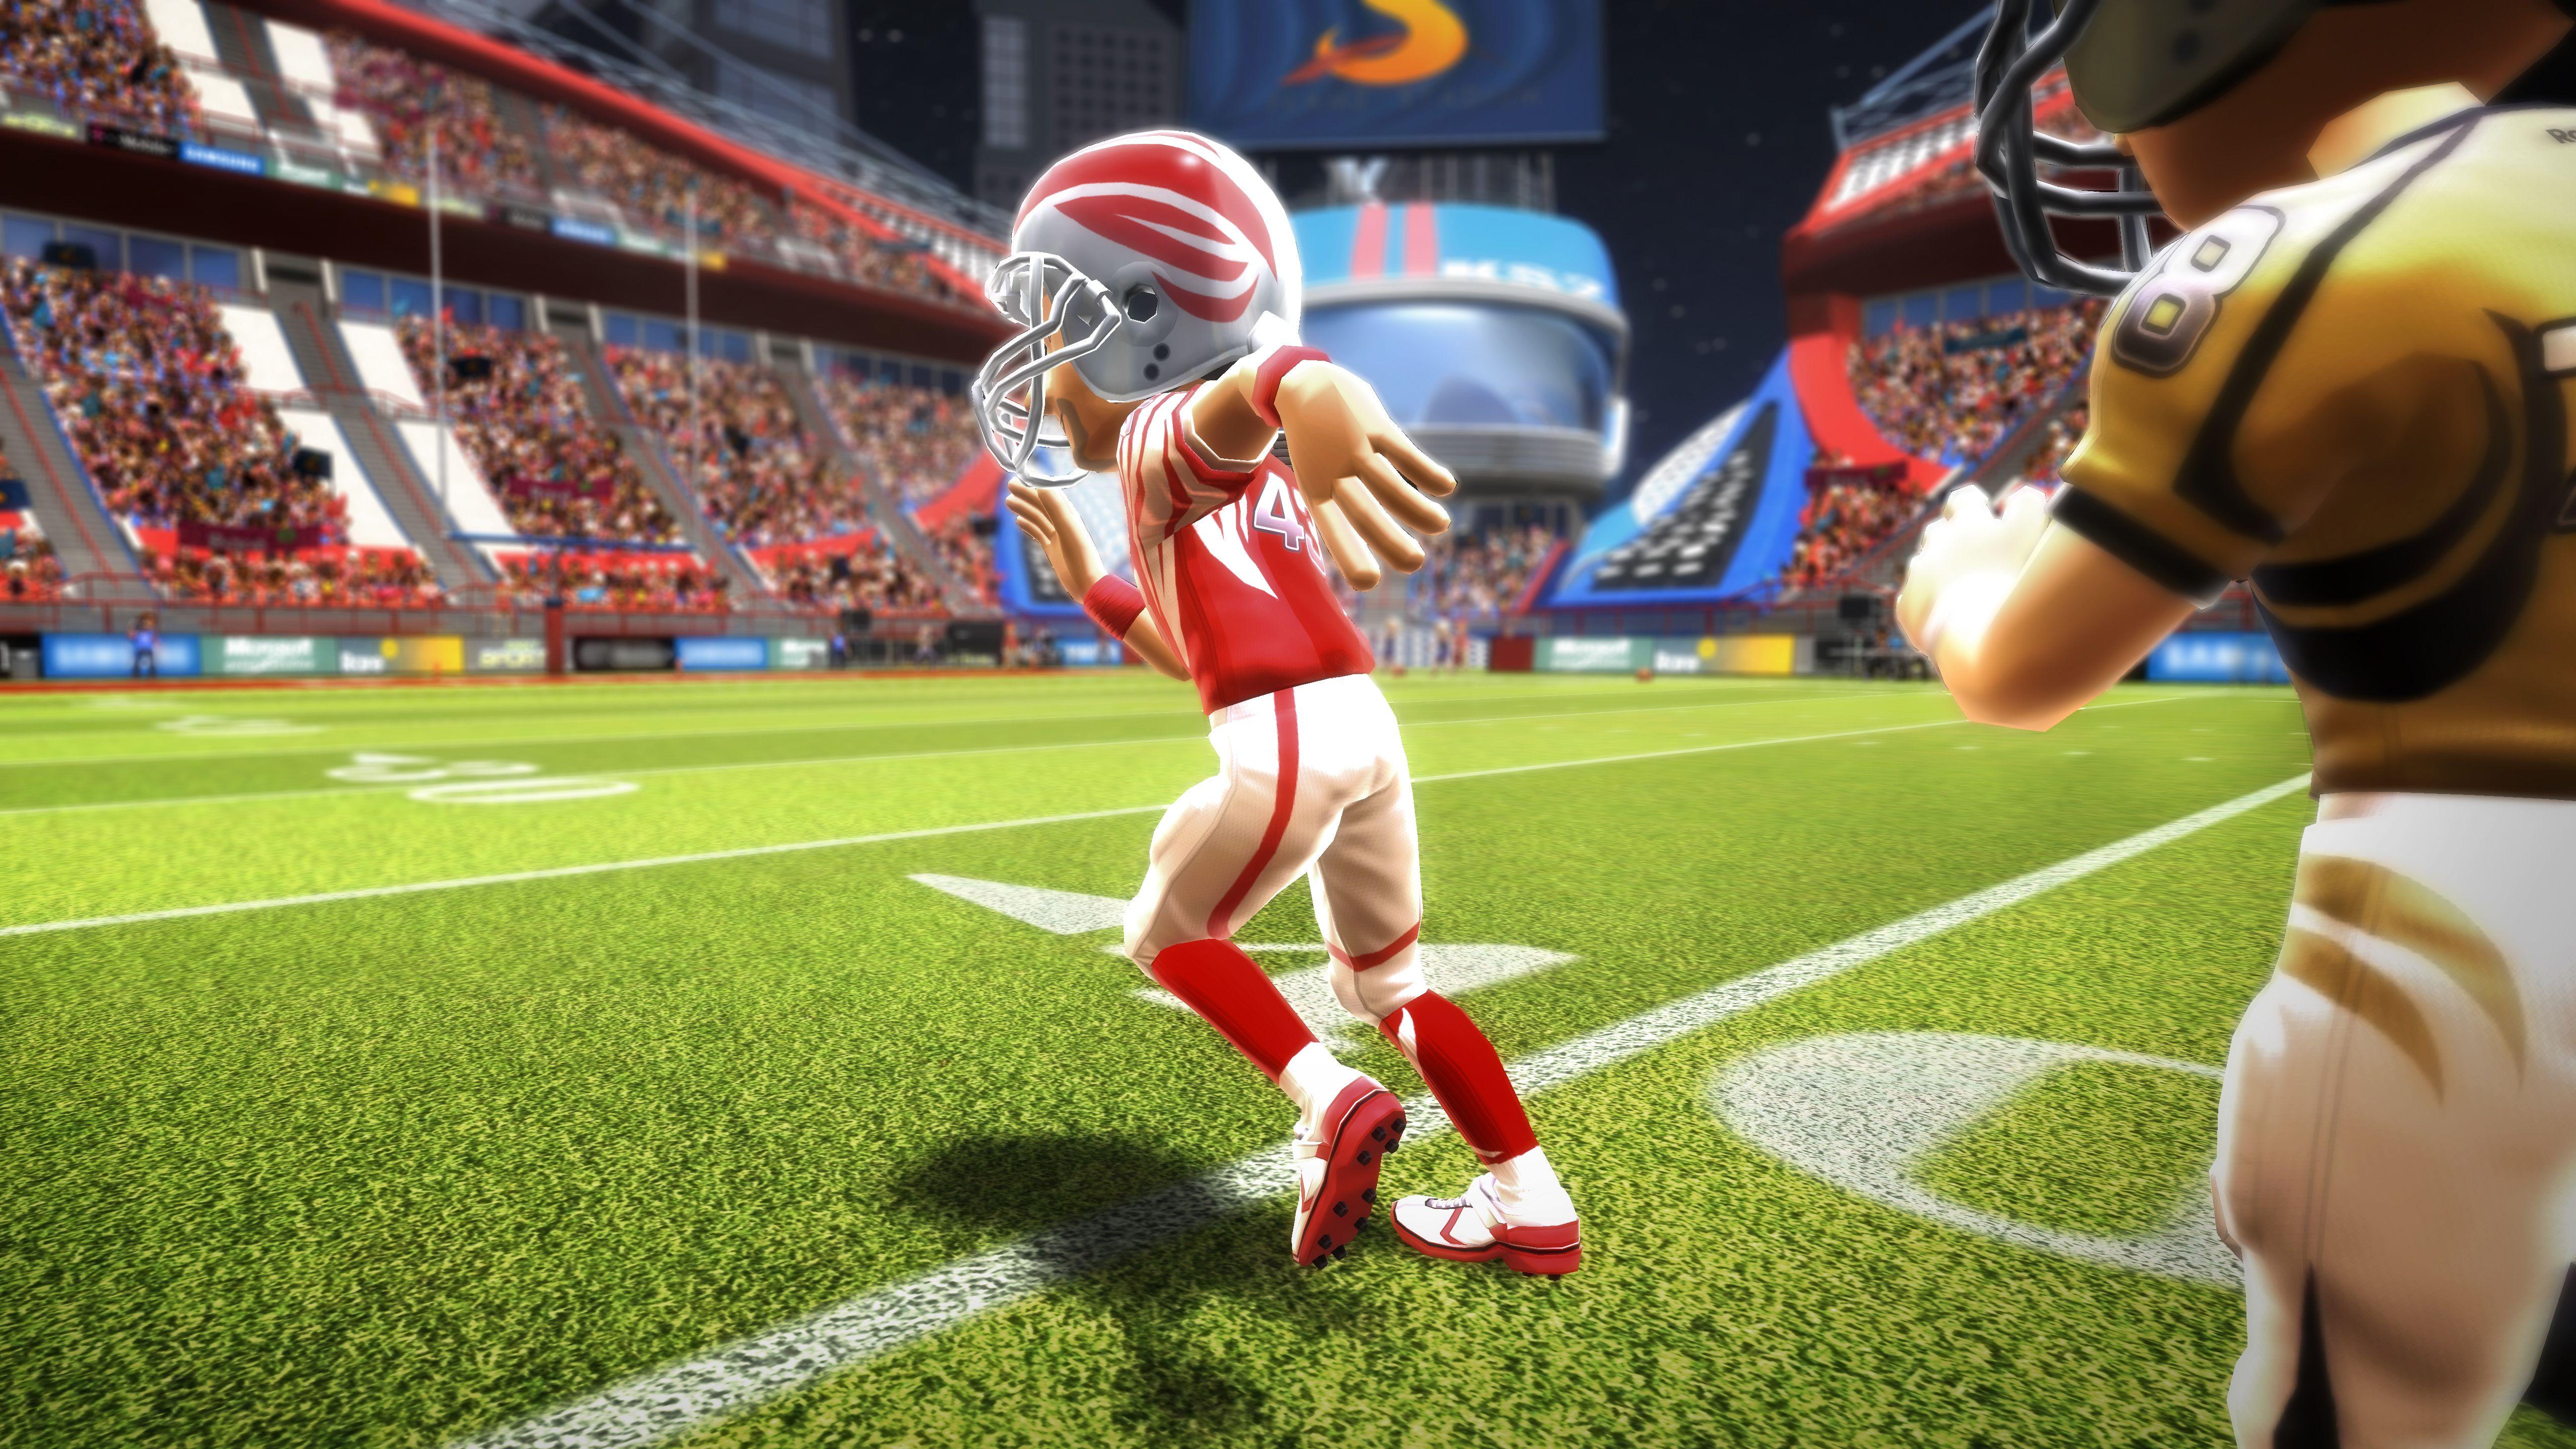 Американский футбол - Kinect Sports: Season Two 5K